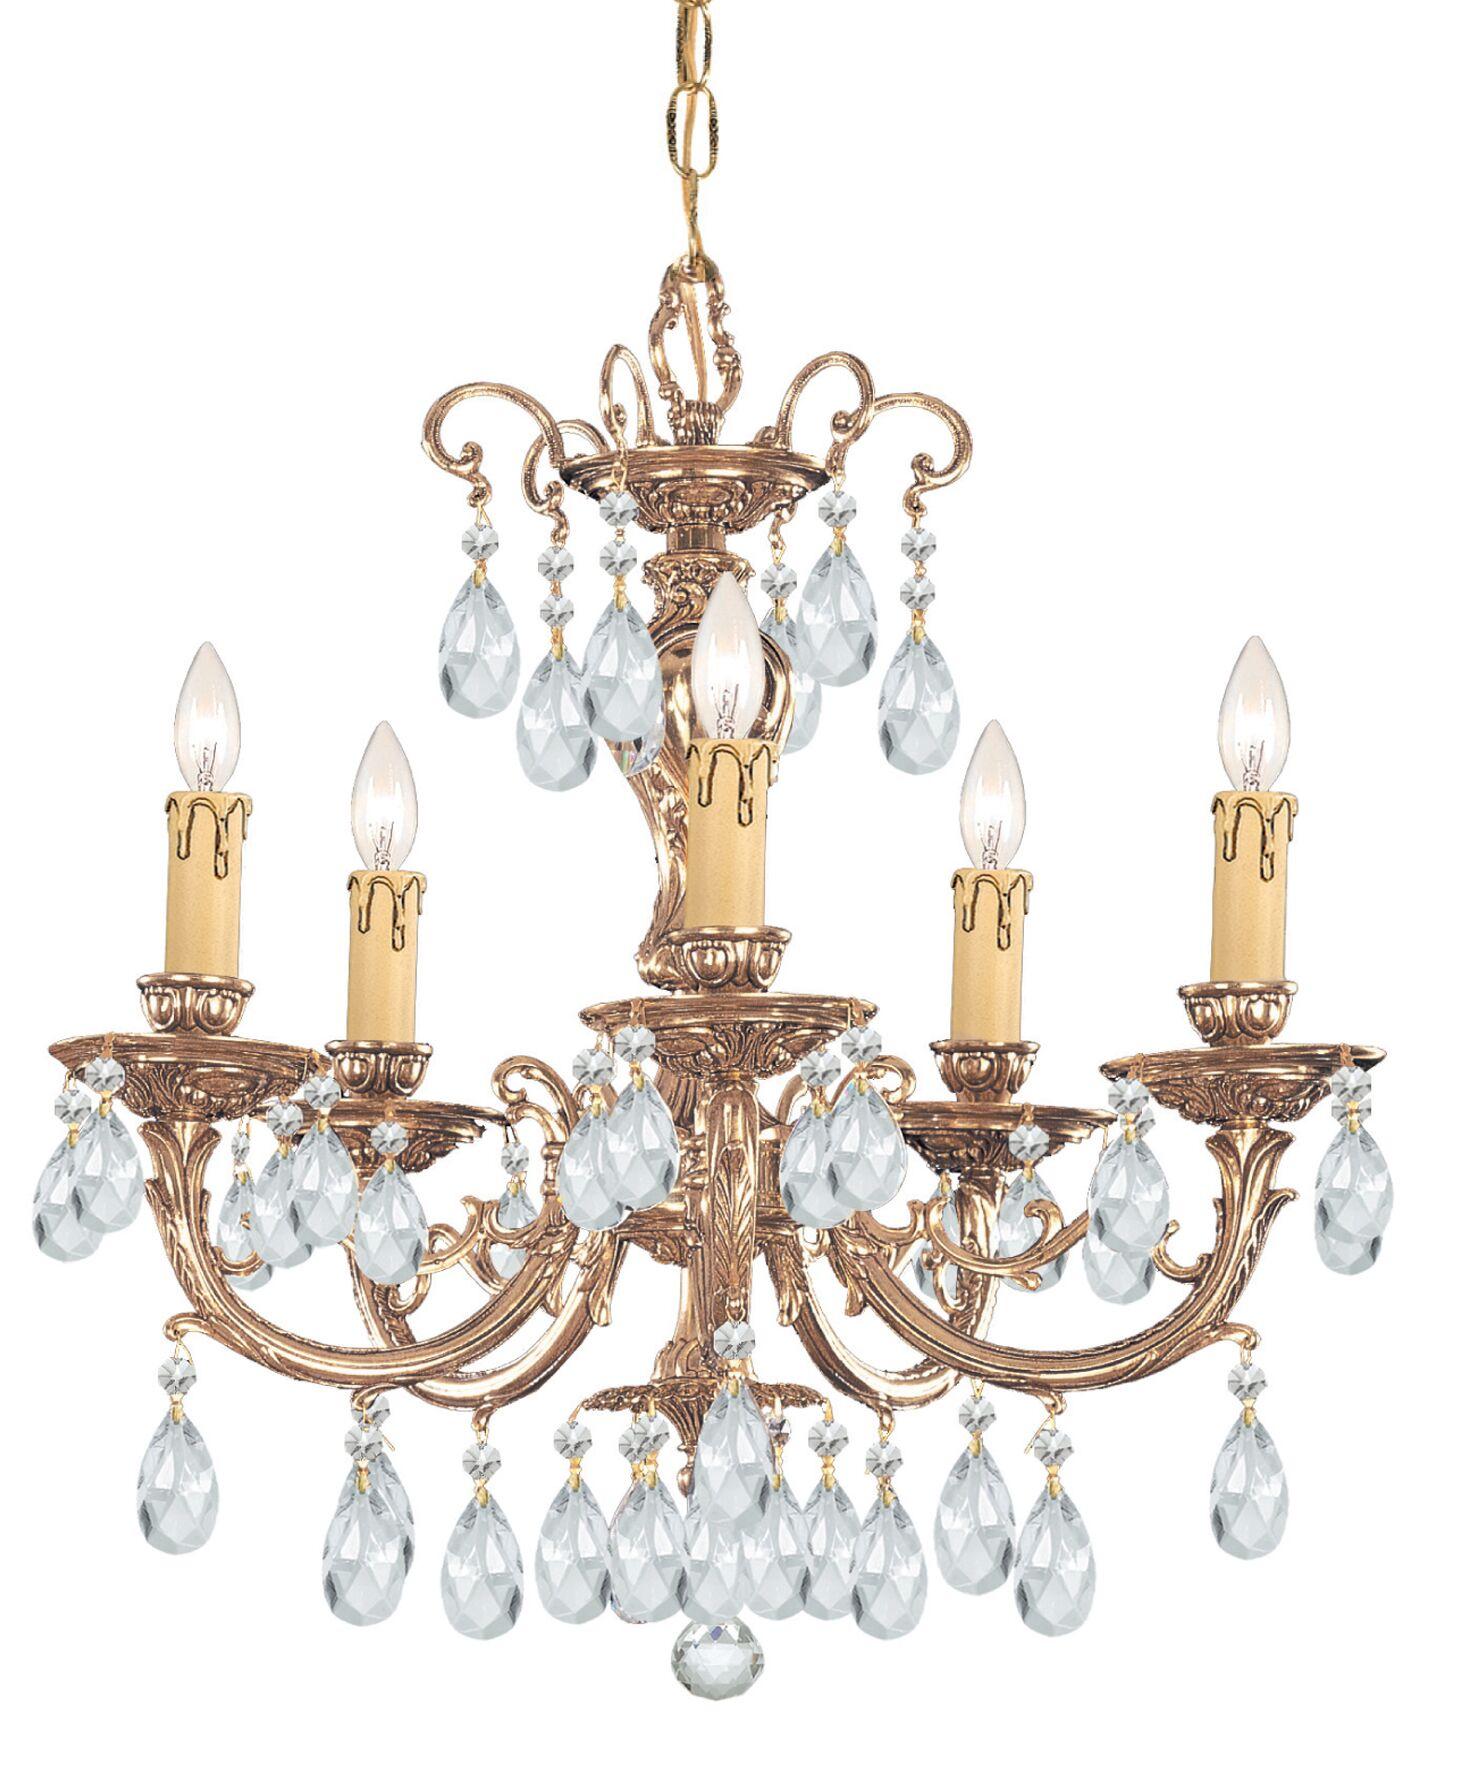 Aureolin 5-Light Crystal Chandelier Crystal: Swarovski Spectra